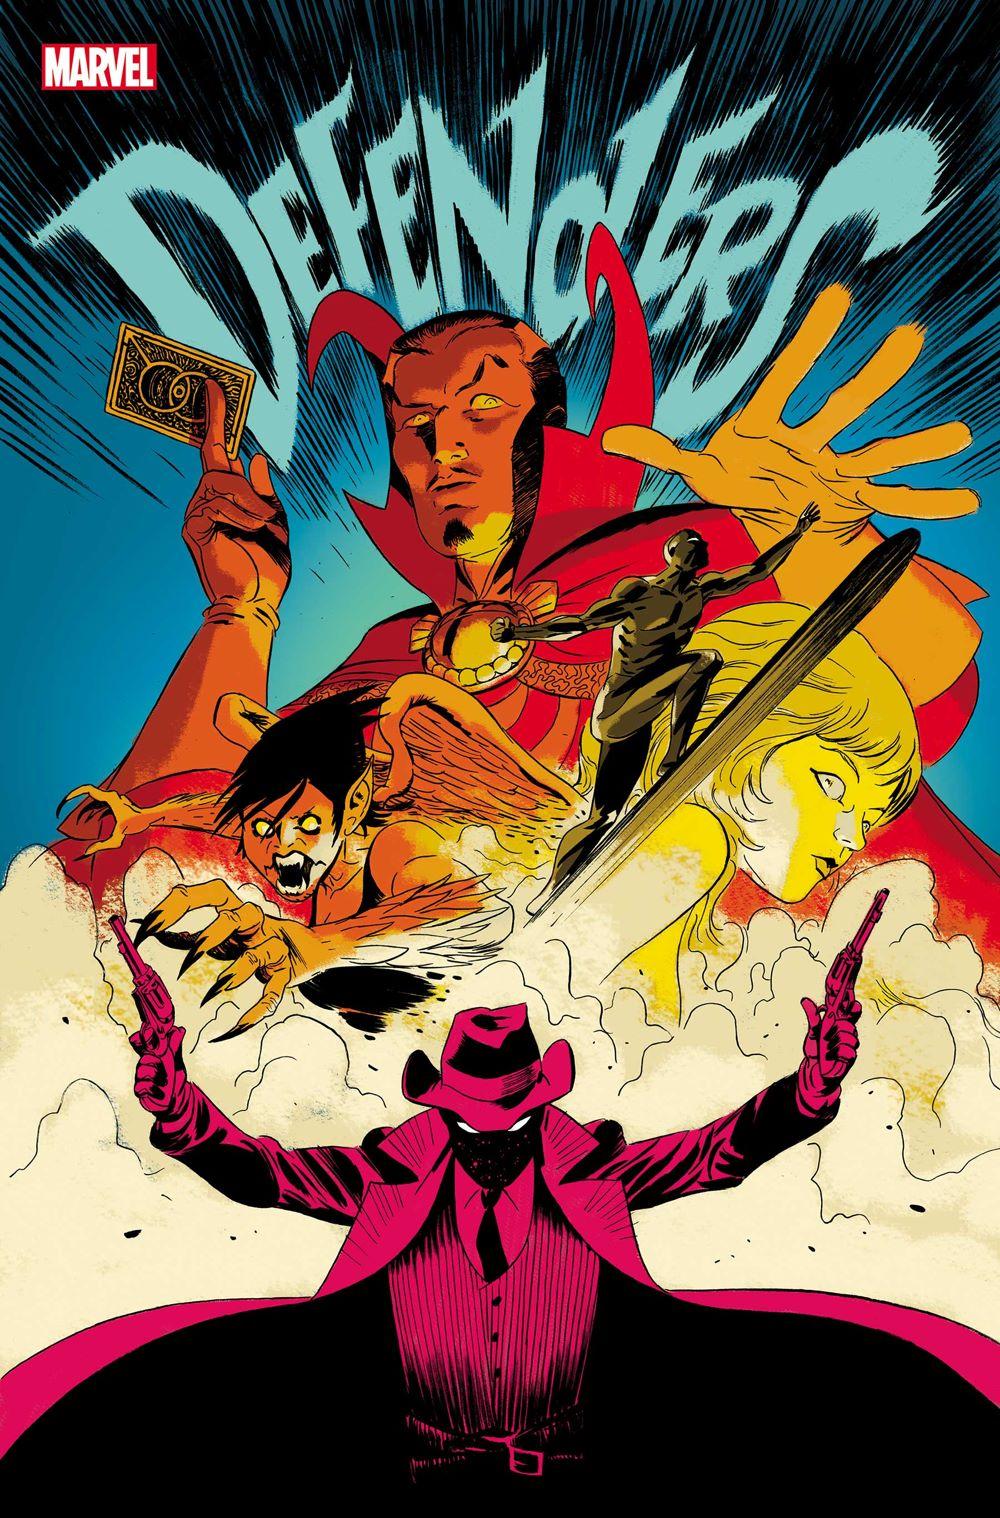 DEFENDERS2021001_Martin_var Marvel Comics August 2021 Solicitations